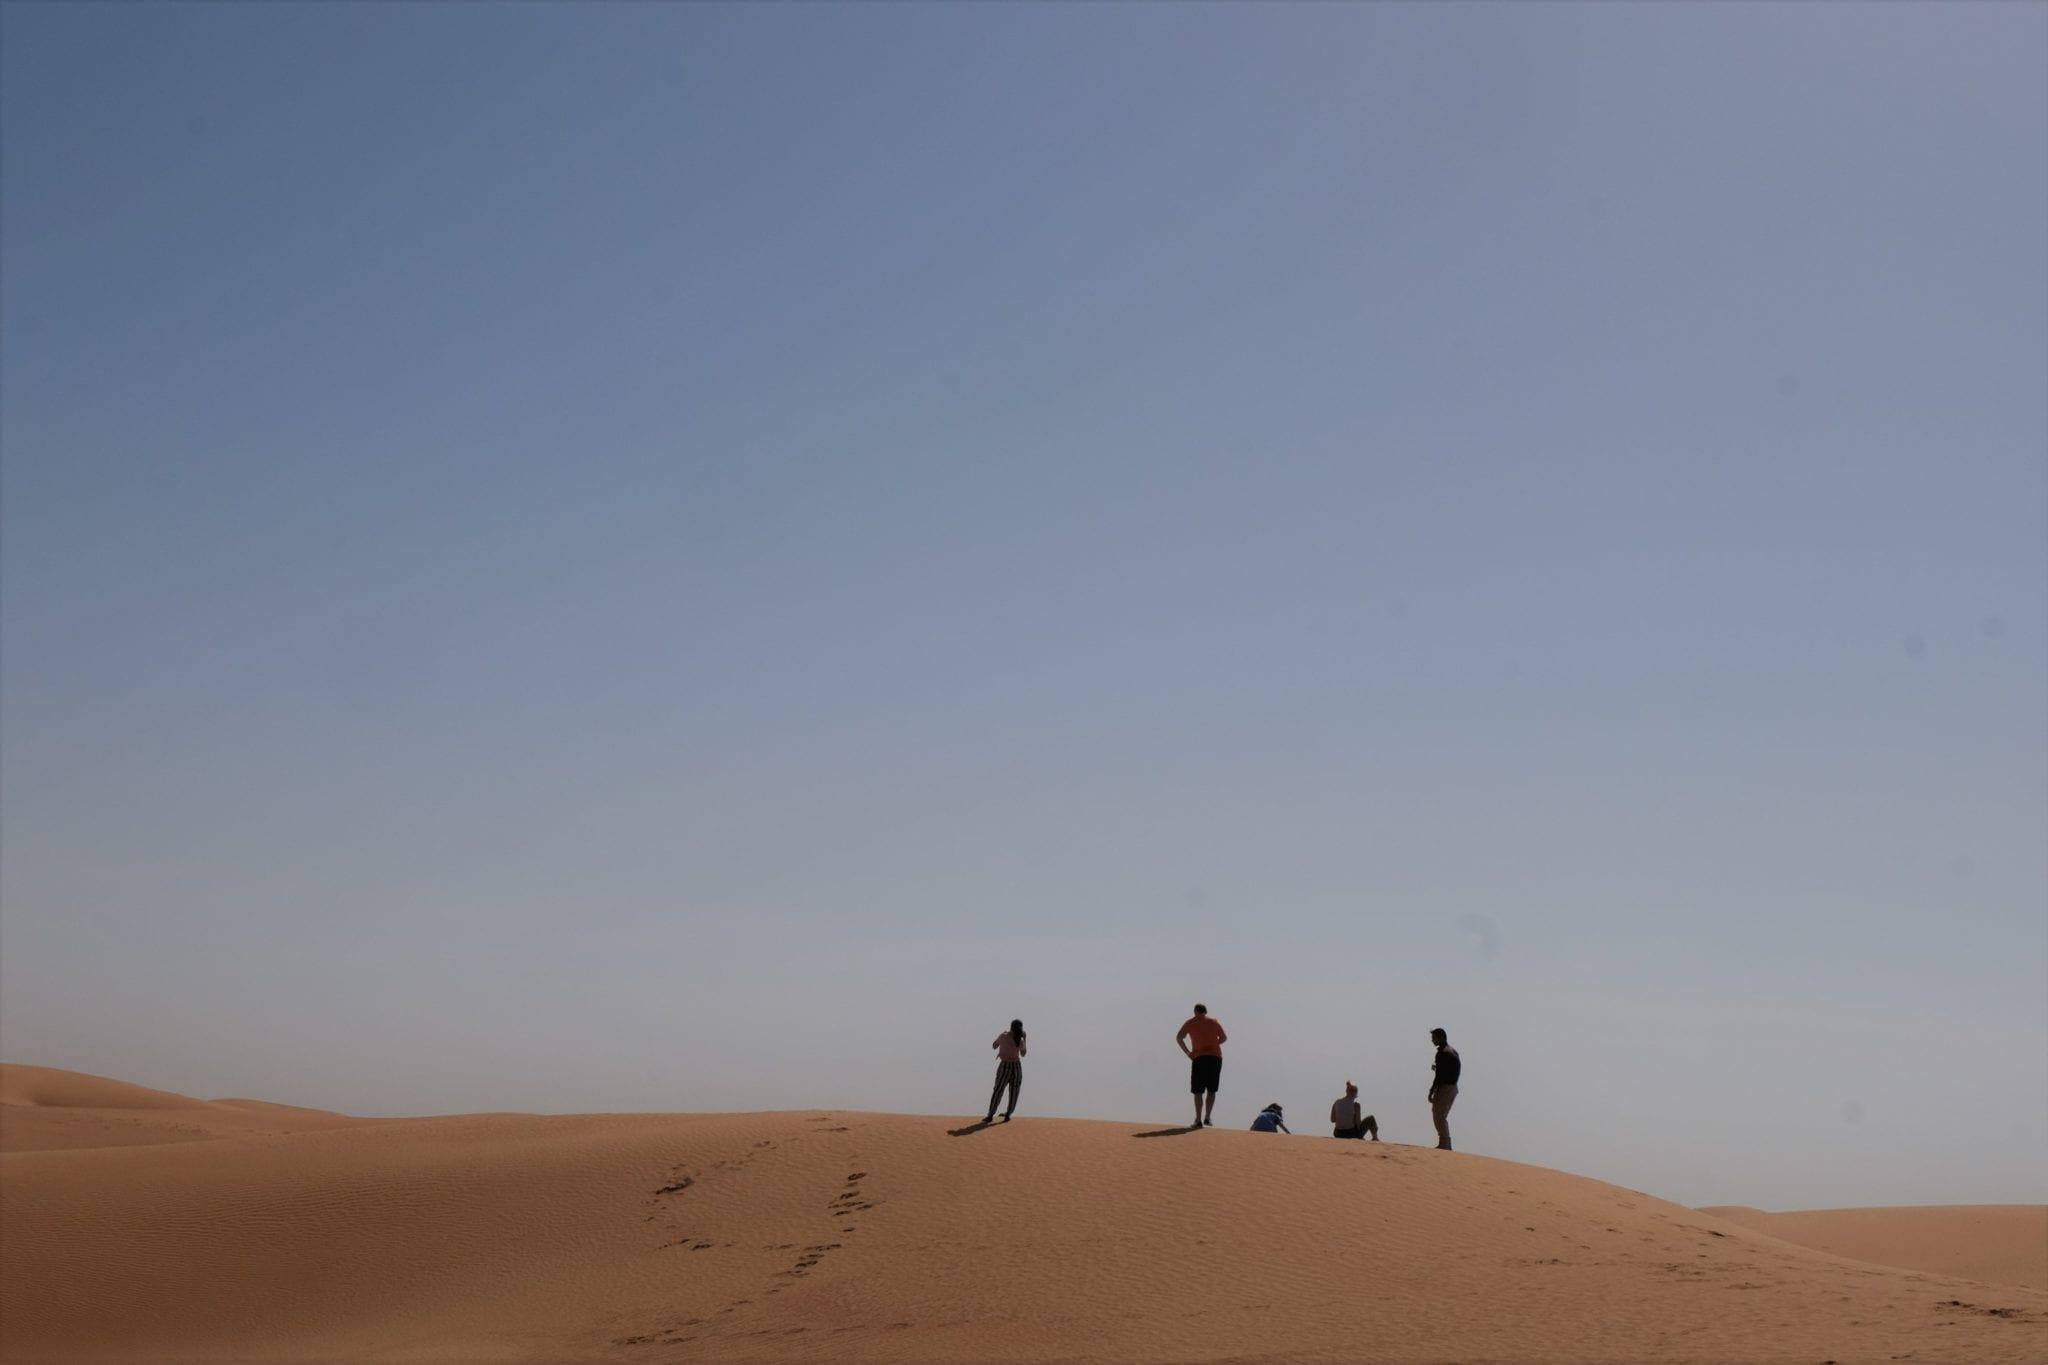 touring the dubai desert